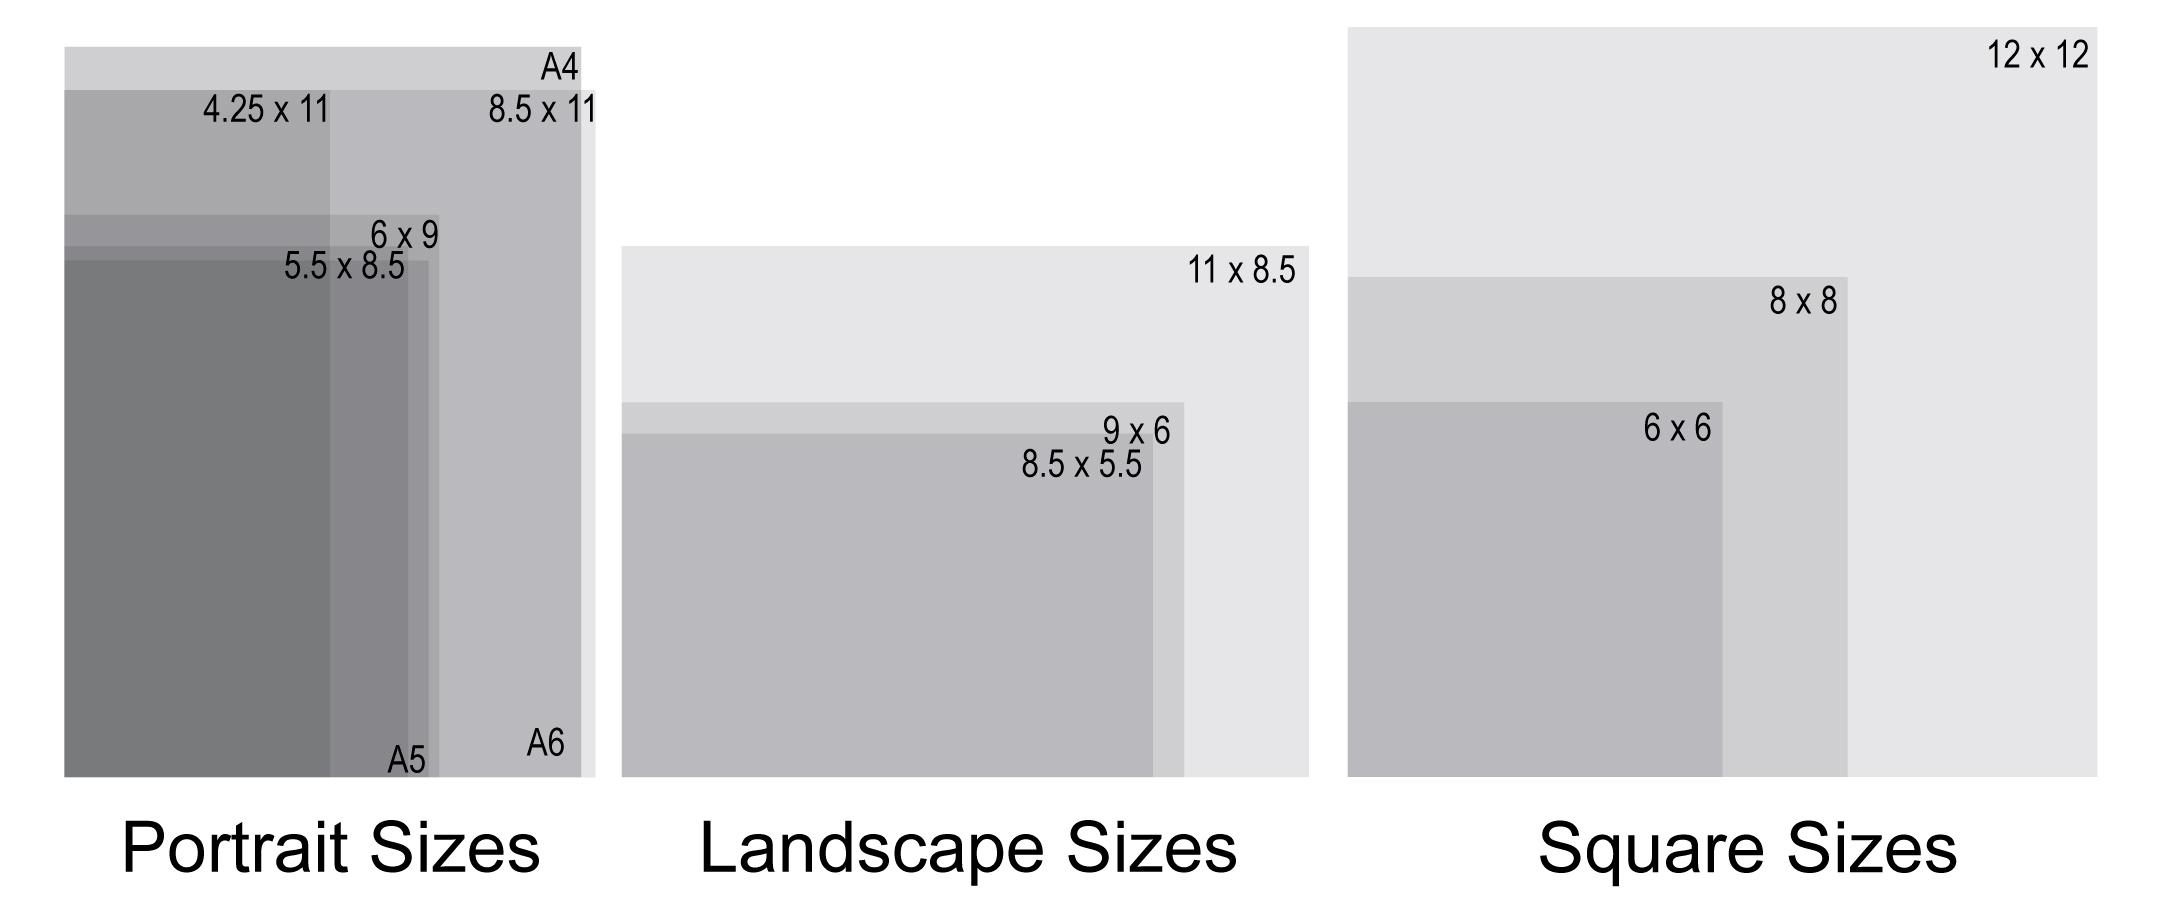 Catalog Sizes offered by PrintingCenterUSA.com